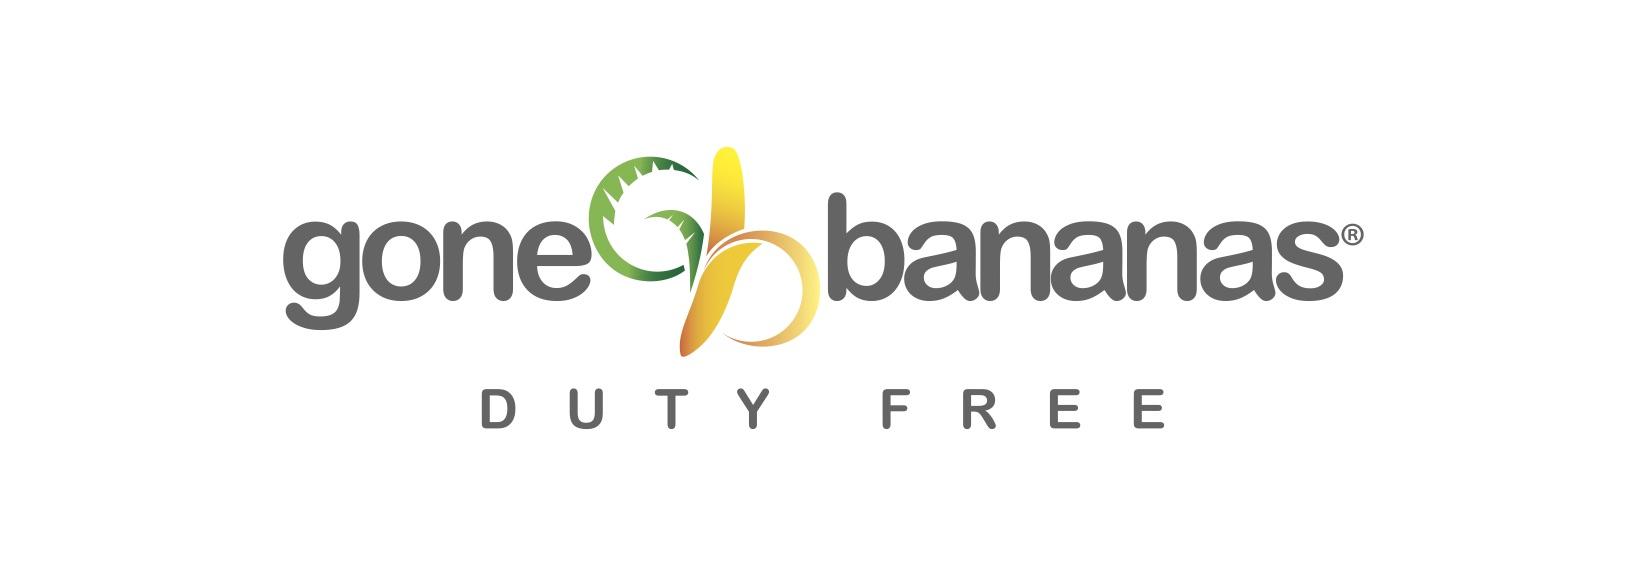 Gone Bananas logo